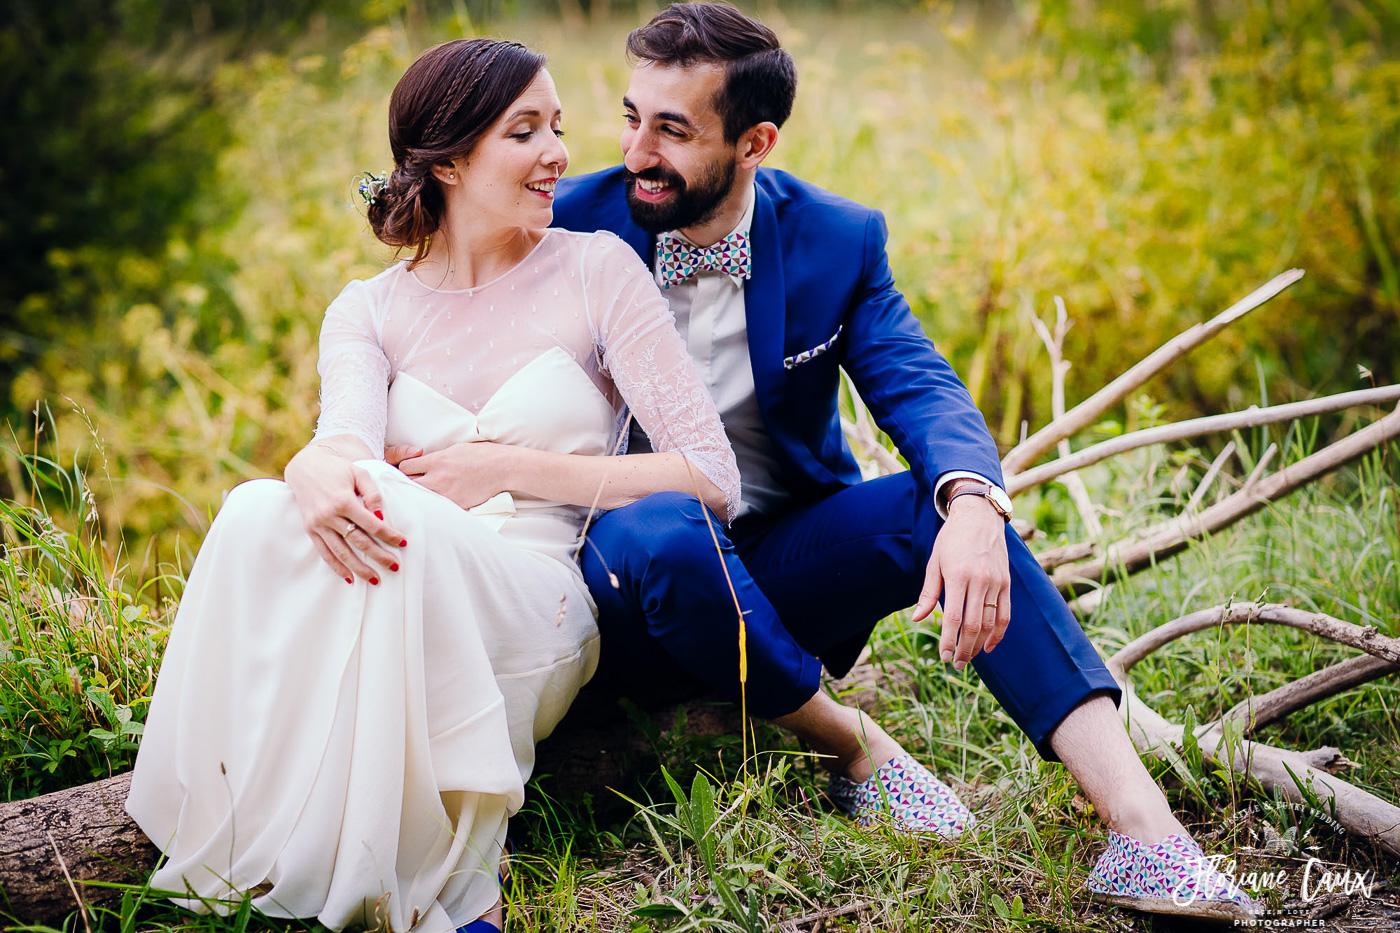 photographe-mariage-pays-basque-Floriane-Caux (46)